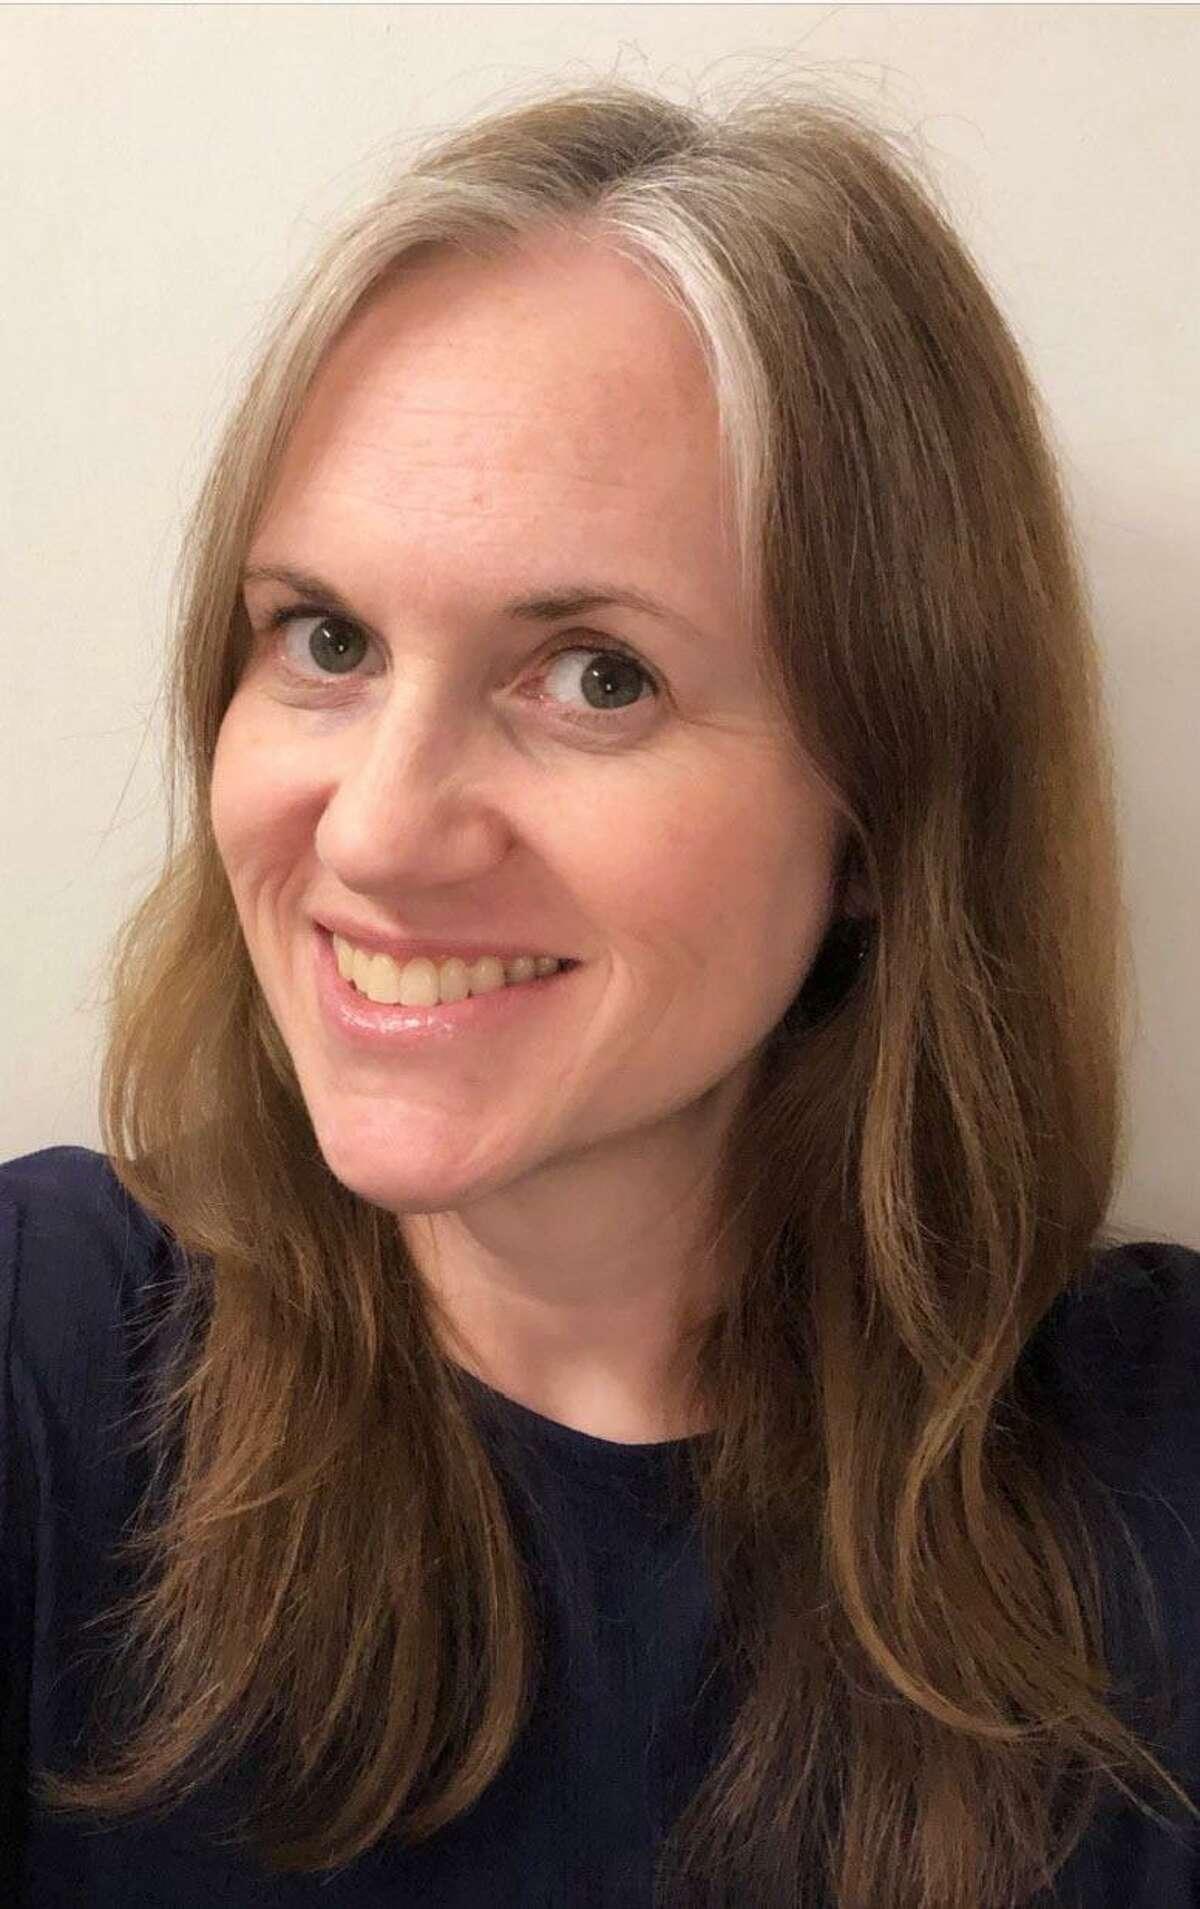 Spectrum/Deborah Rose, editor of The Greater New Milford Spectrum. Photo use for Column